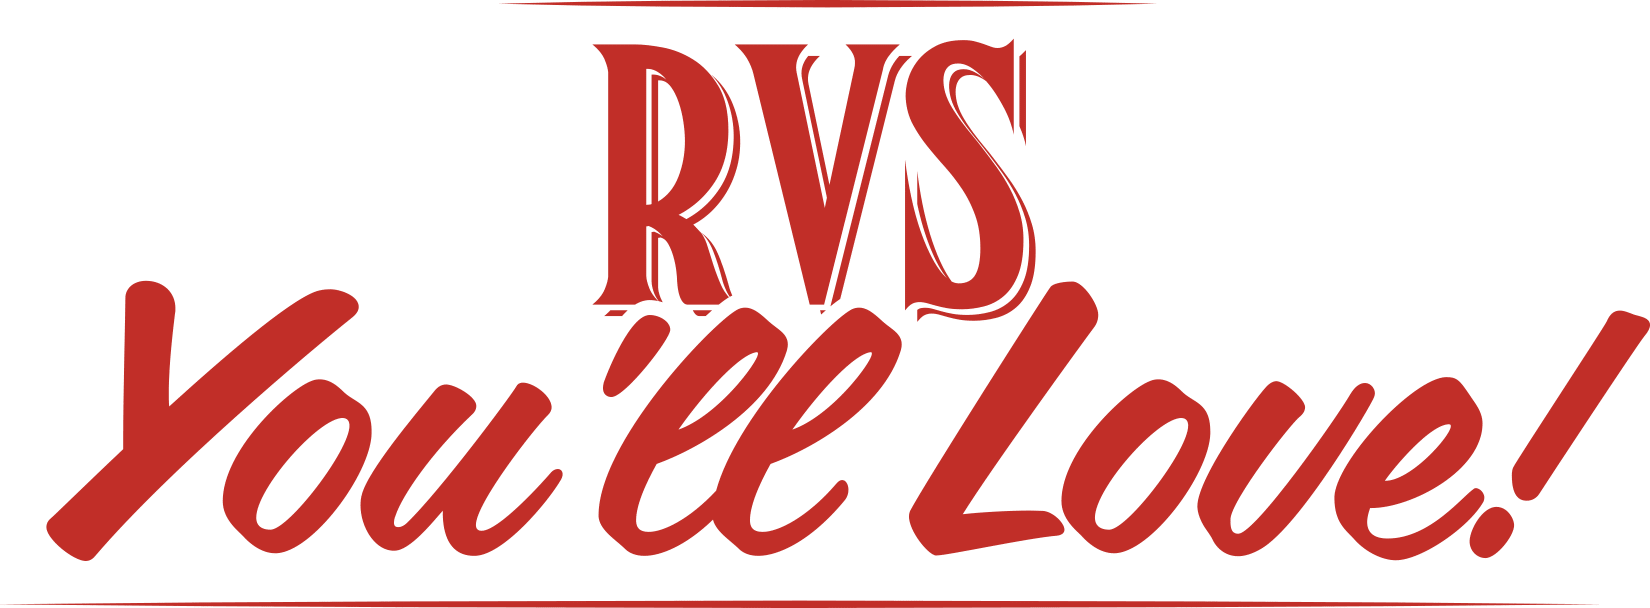 RVs You'll Love